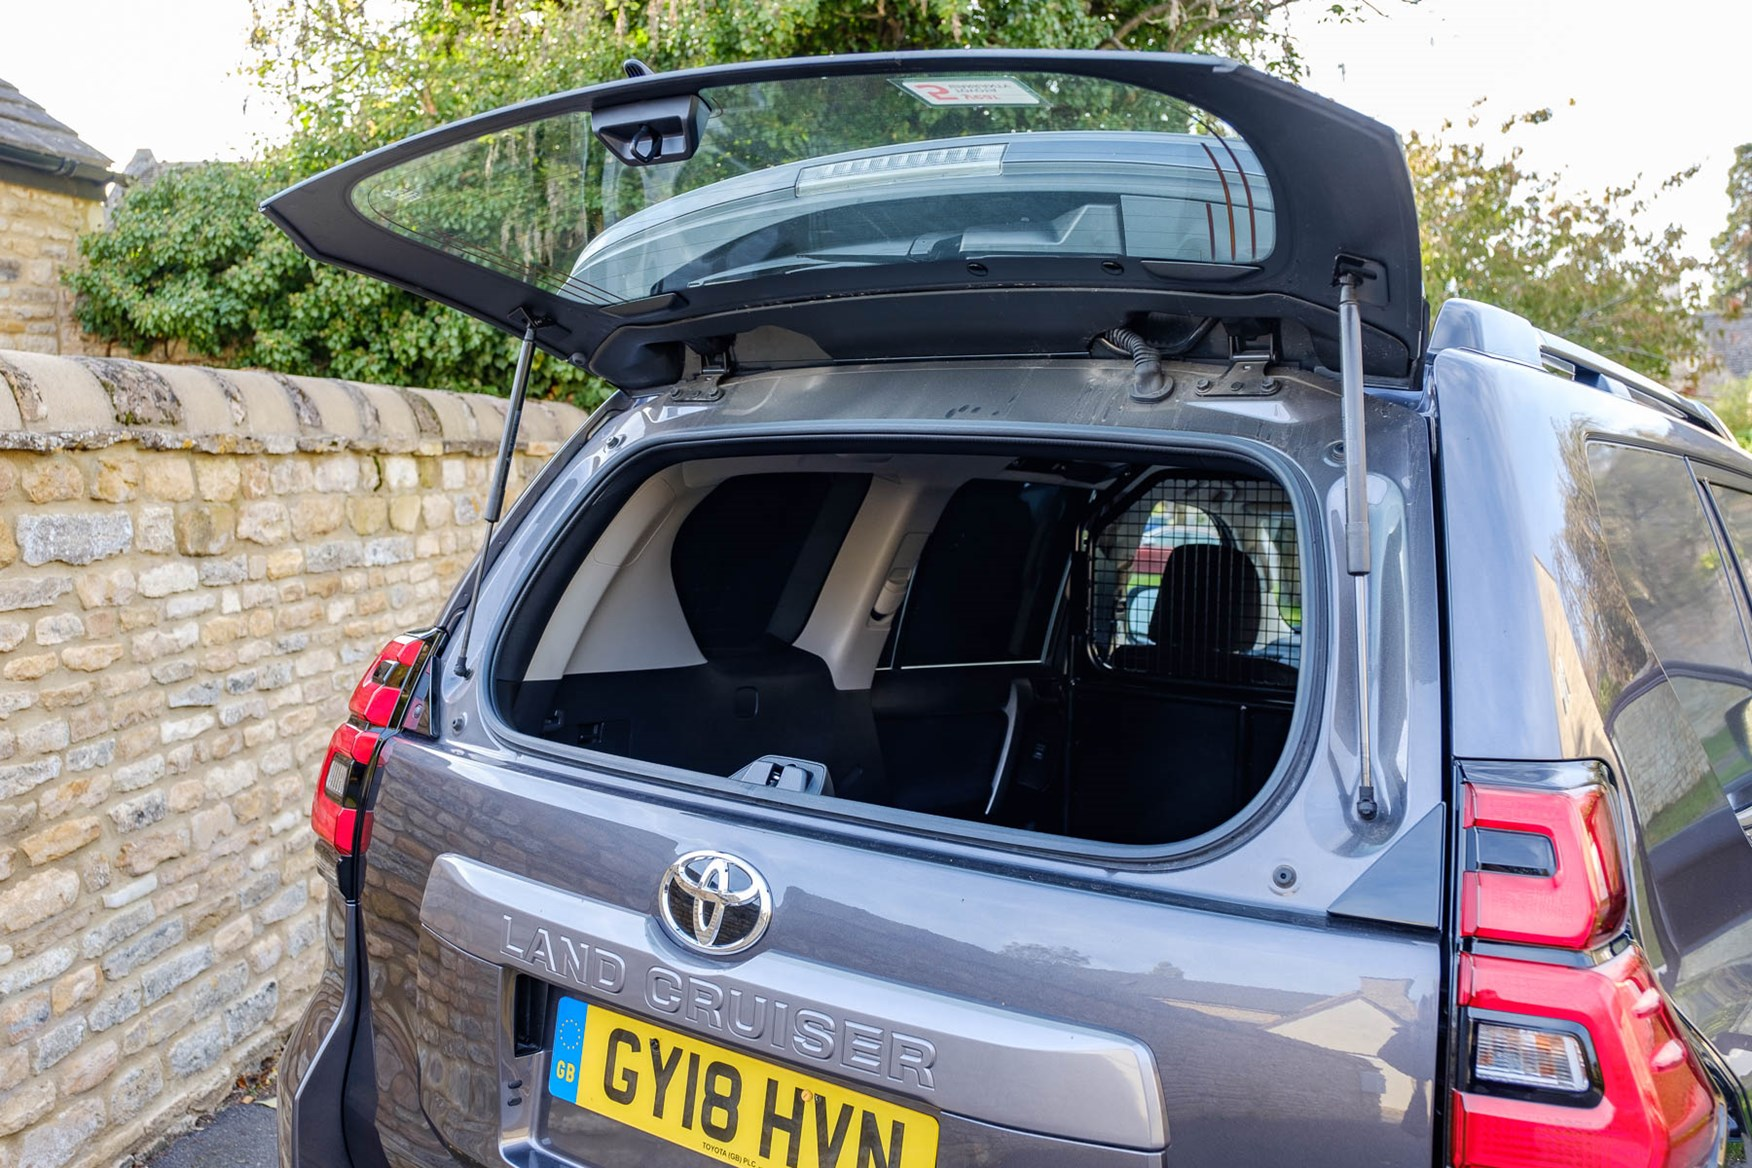 Toyota Land Cruiser glass rear hatch